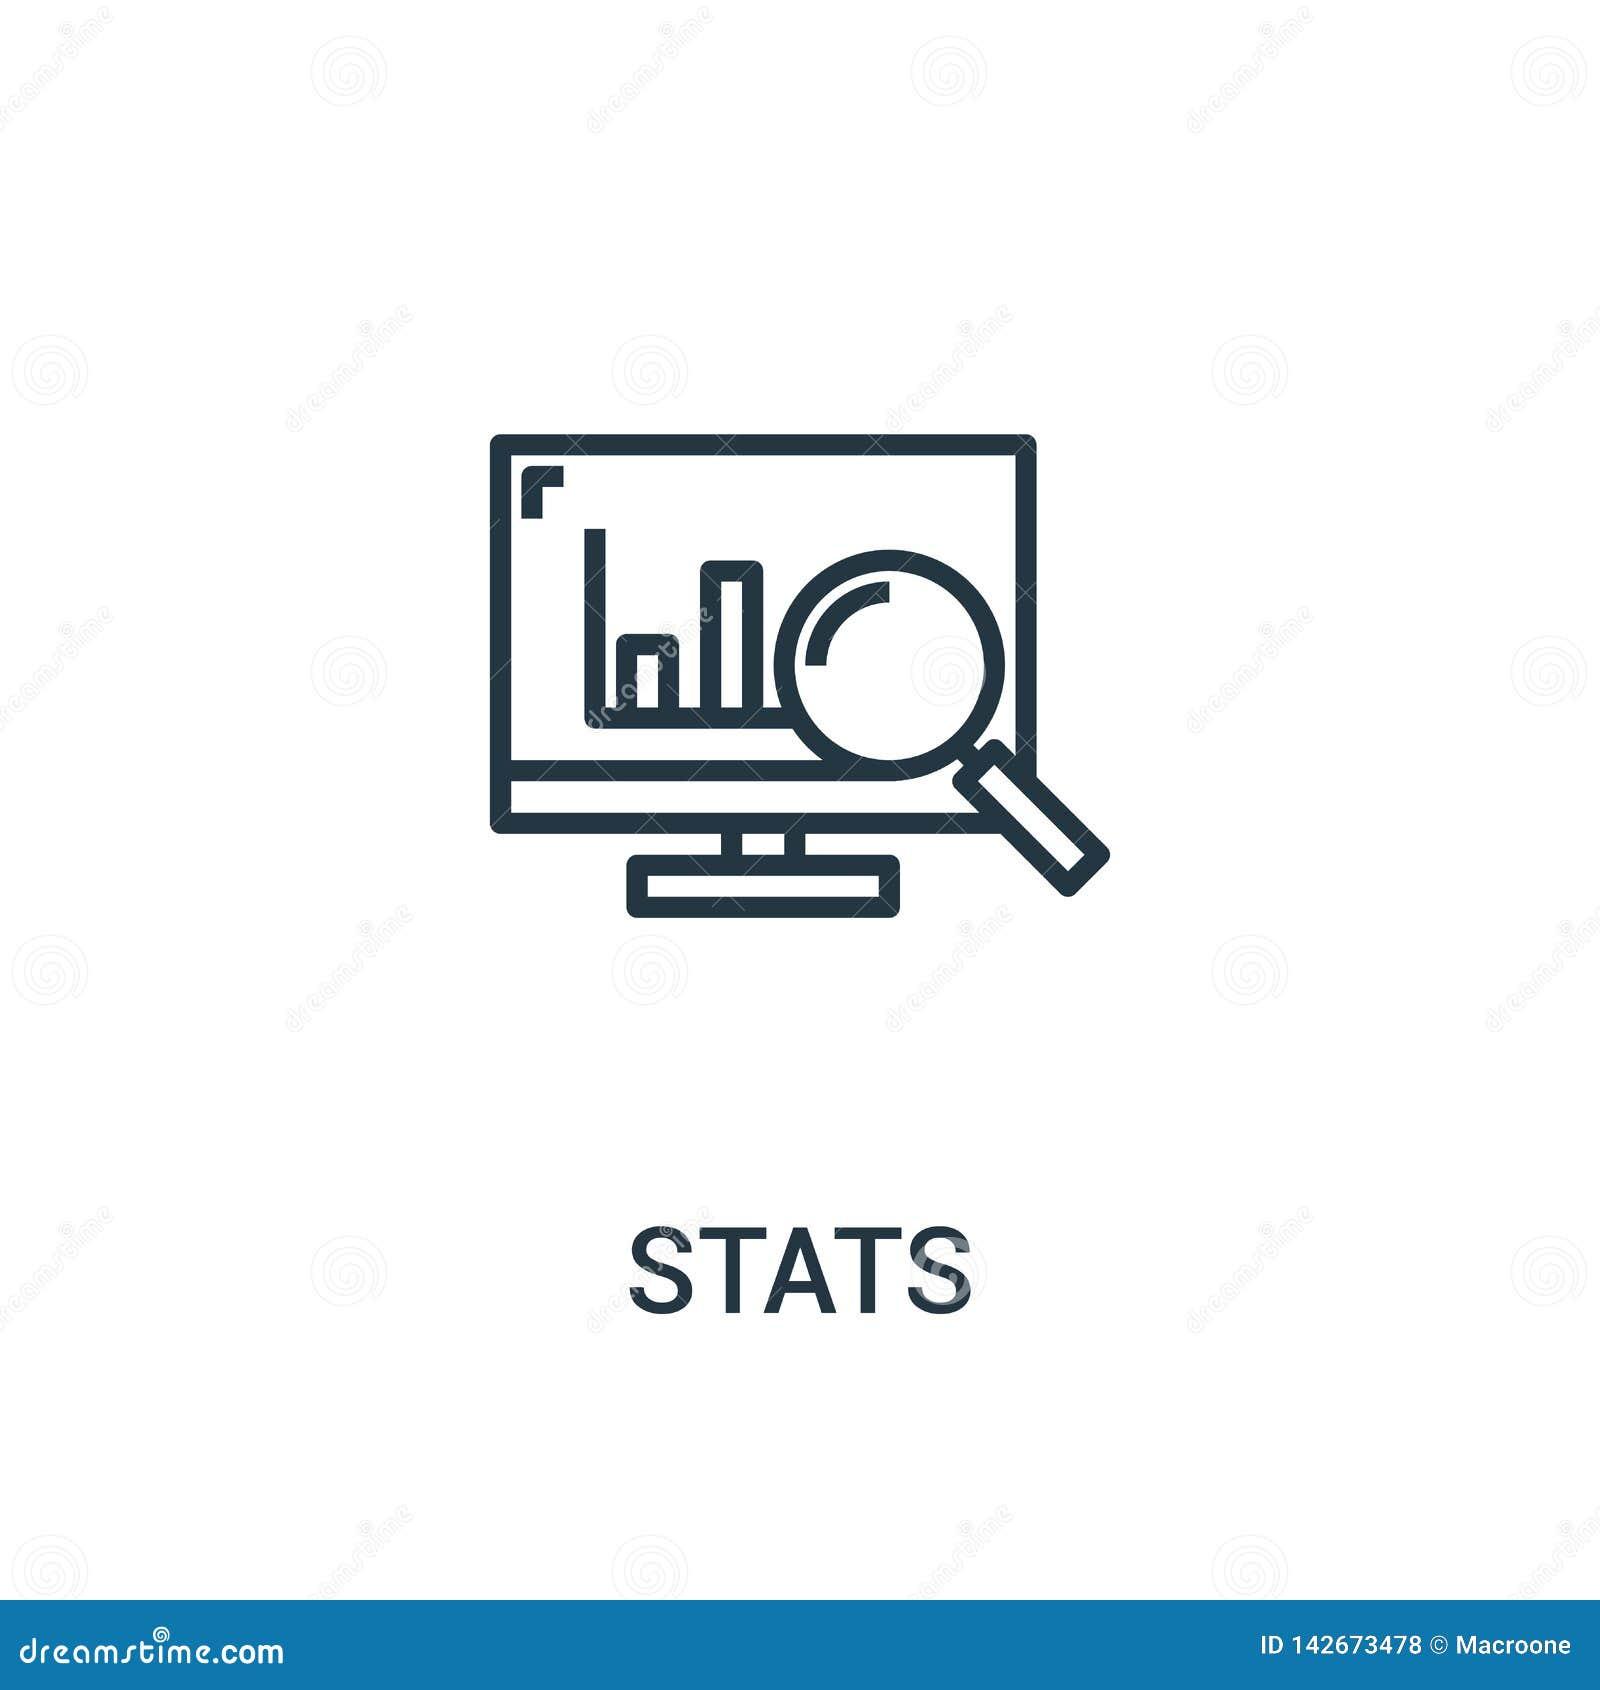 Stats διάνυσμα εικονιδίων από τη συλλογή seo Η λεπτή γραμμή stats περιγράφει τη διανυσματική απεικόνιση εικονιδίων Γραμμικό σύμβο